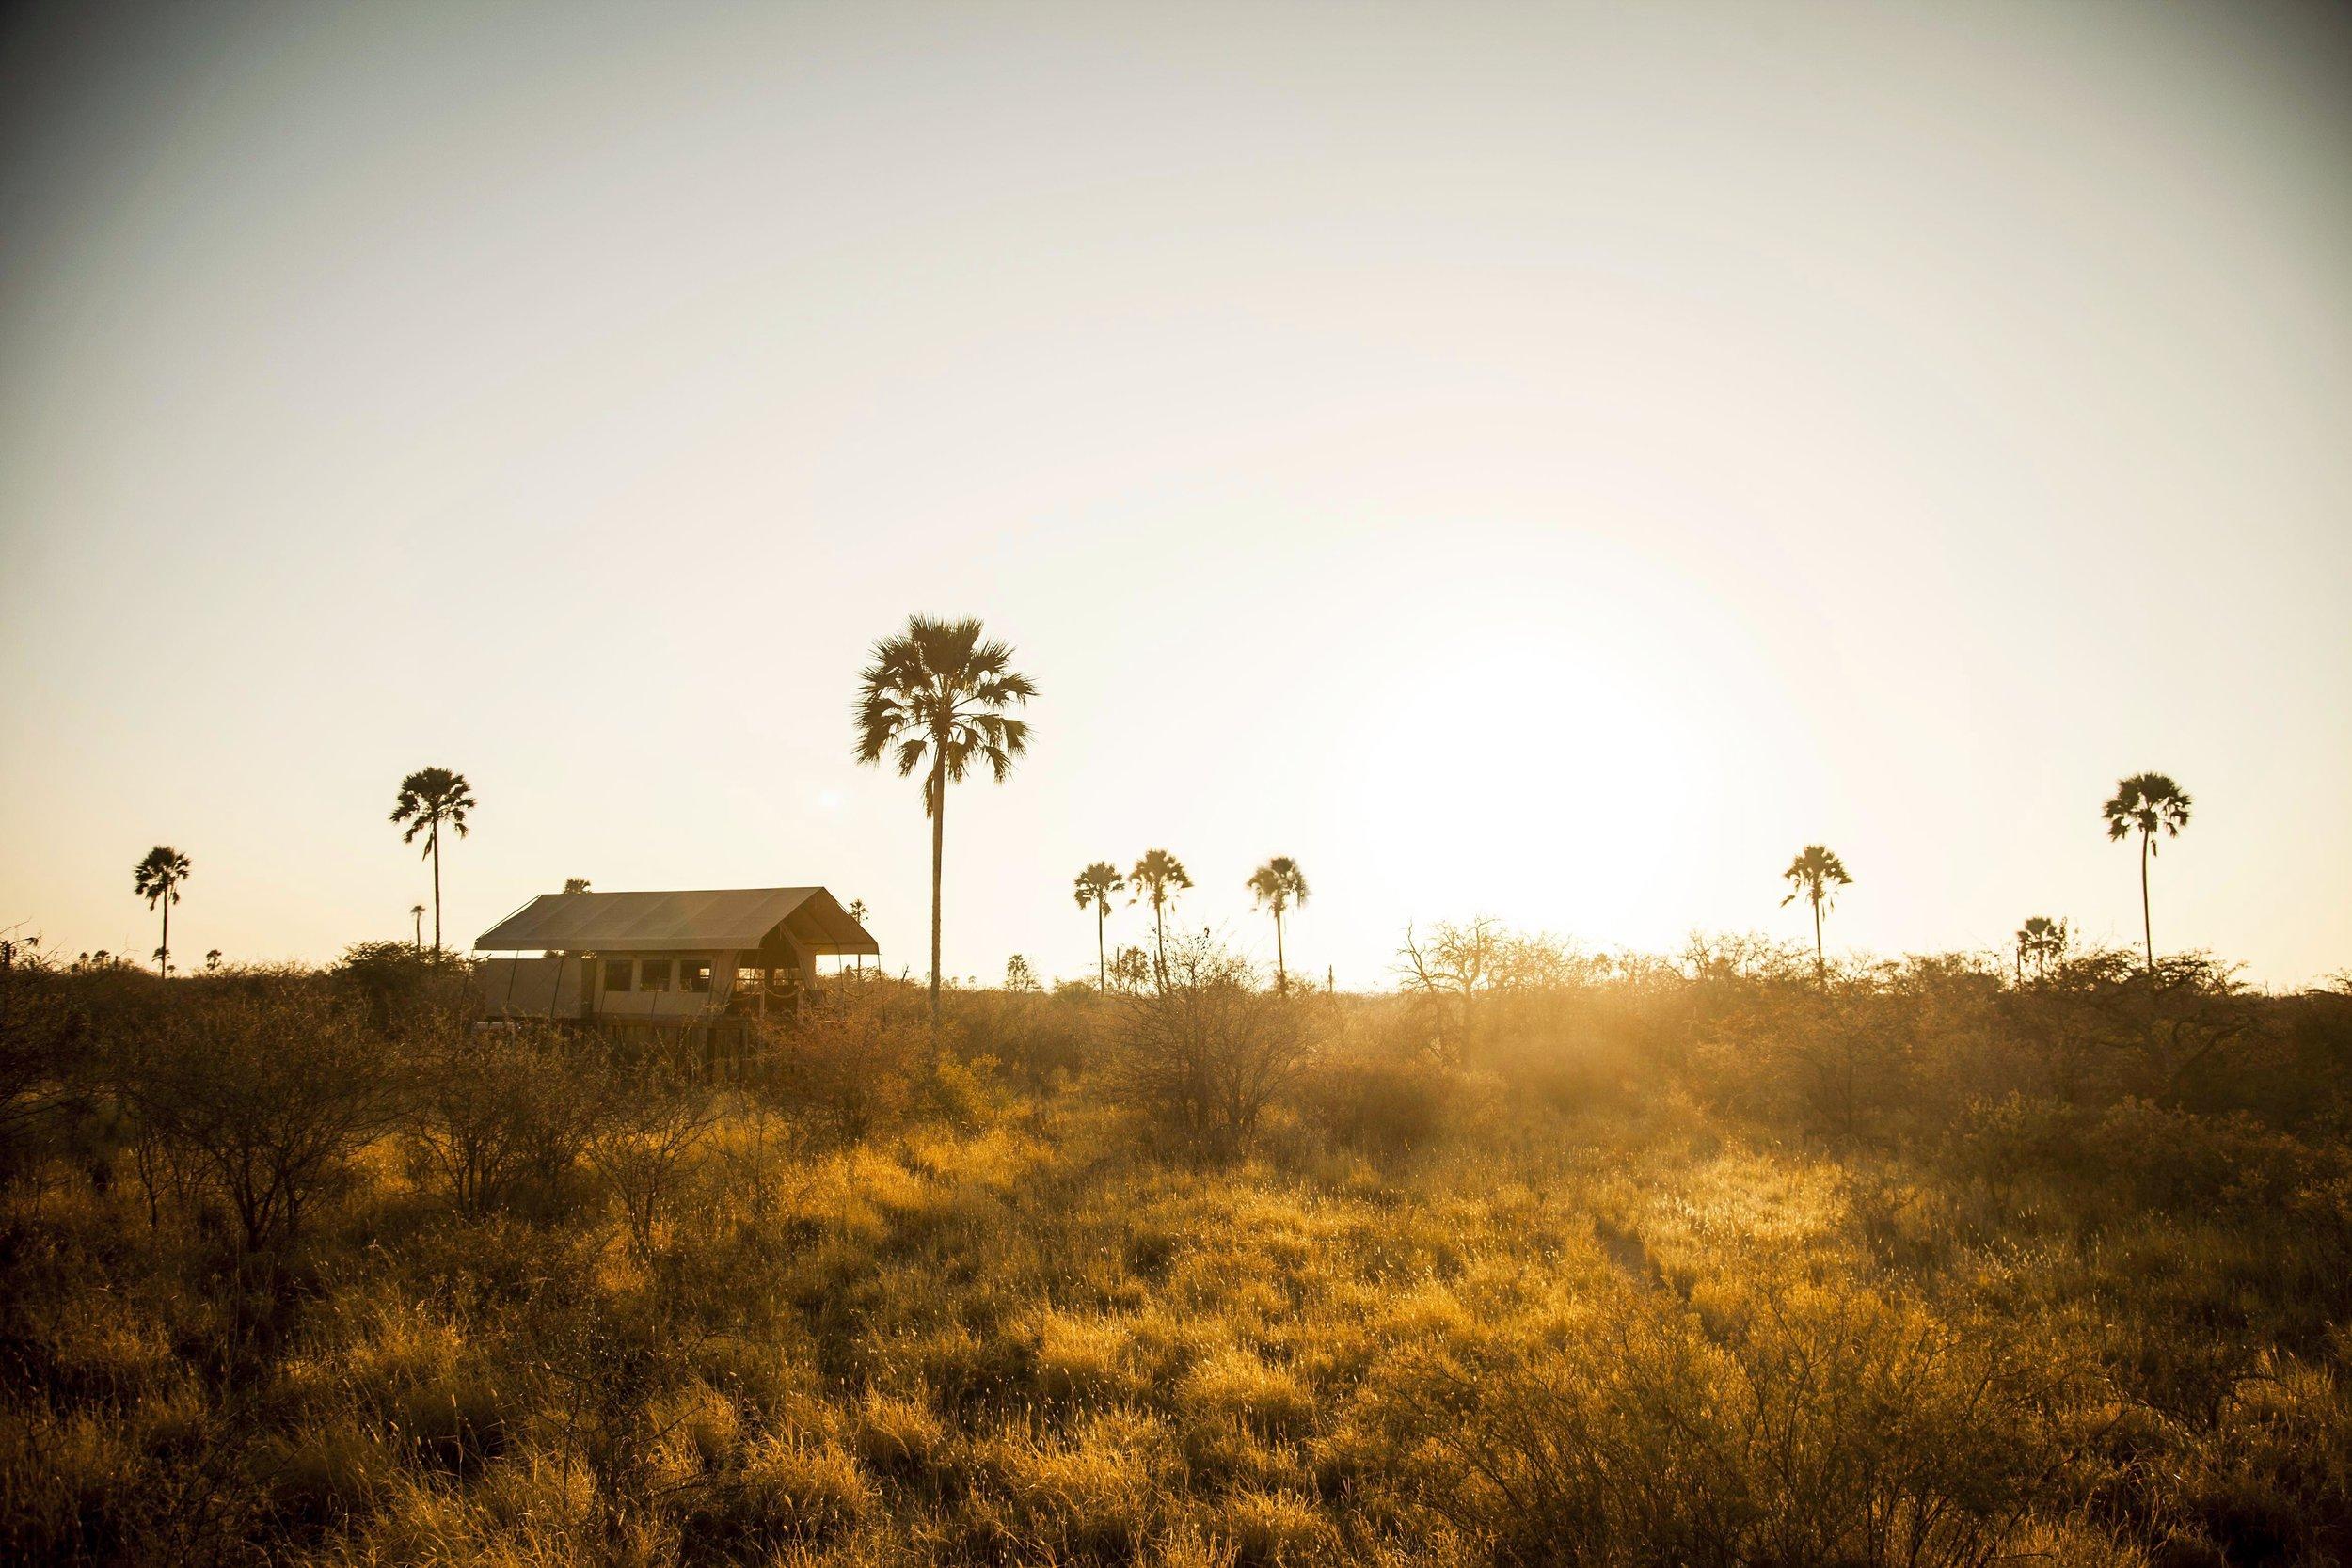 DavidCrookes_Camp_Kalahari_UnchartedAfrica_13-3133_21.jpg